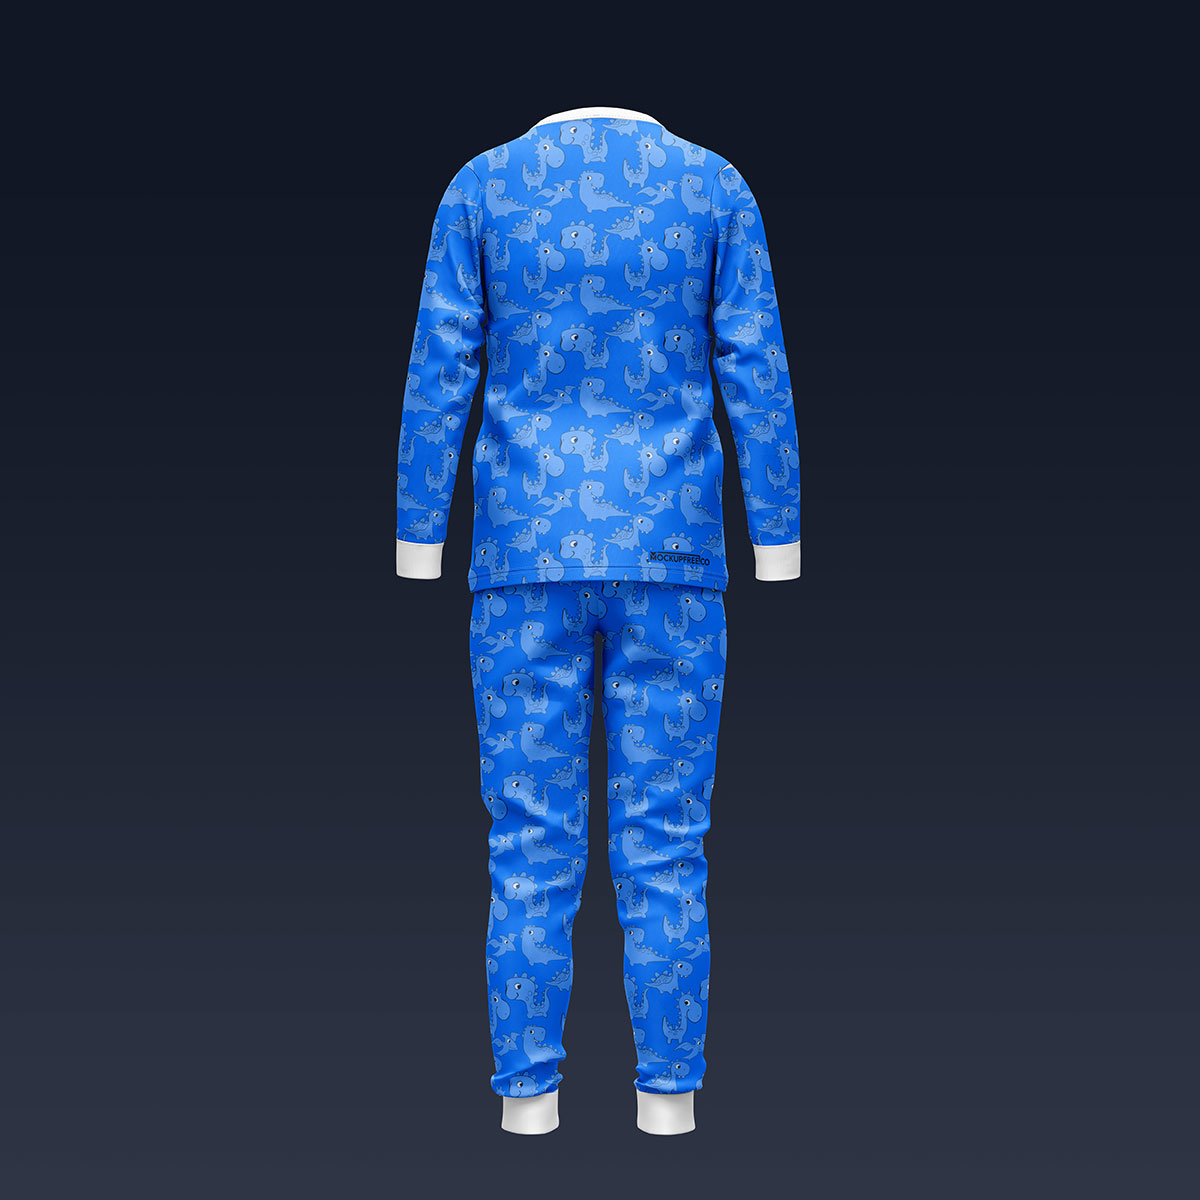 Free Children's Nightdress Sleepwear Pajamas Mockup PSD Set